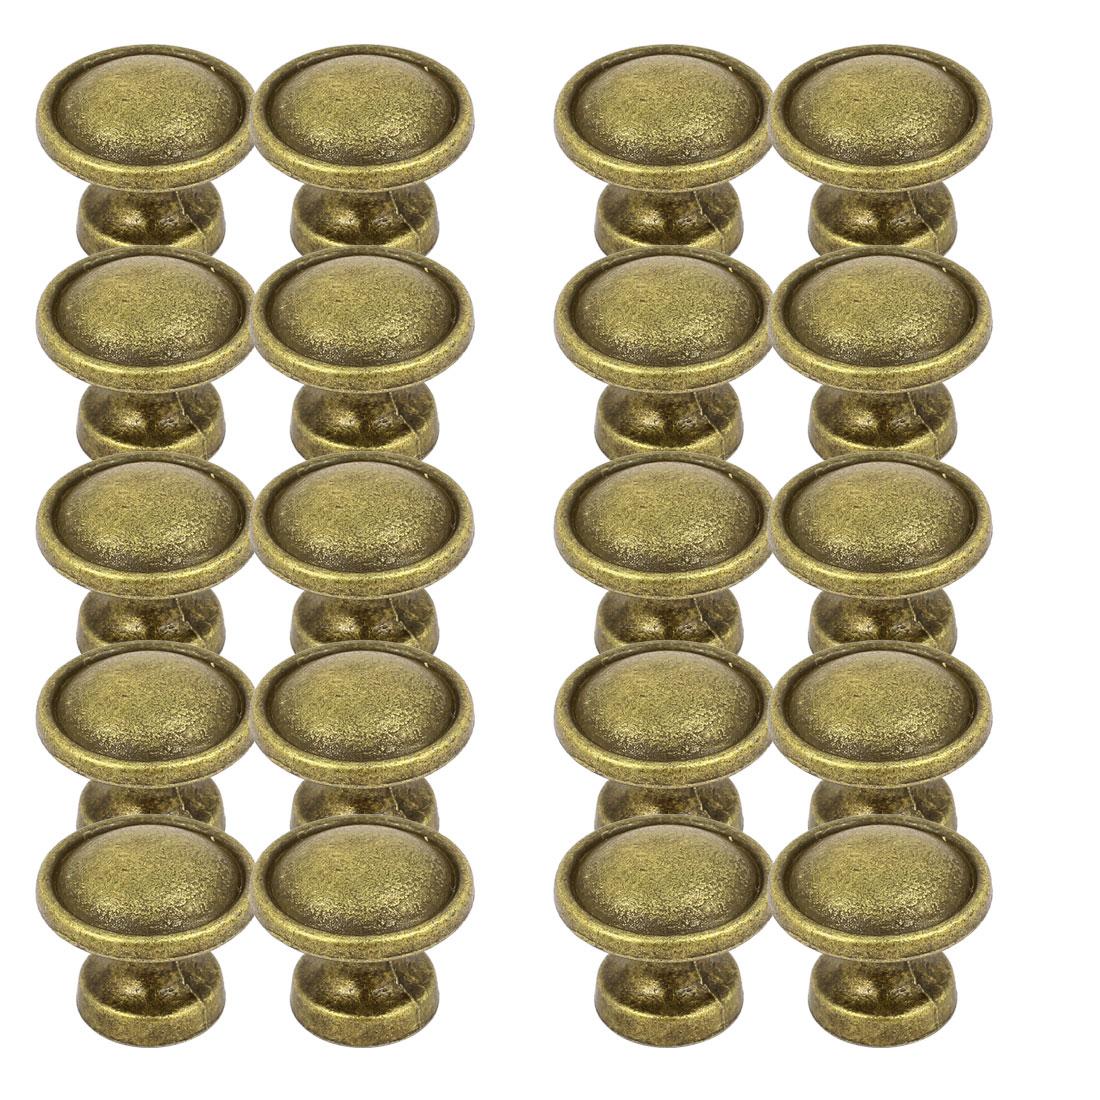 Cupboard Cabinet Zinc Alloy Round Shape Screw Type Pull Knob Bronze Tone 20pcs